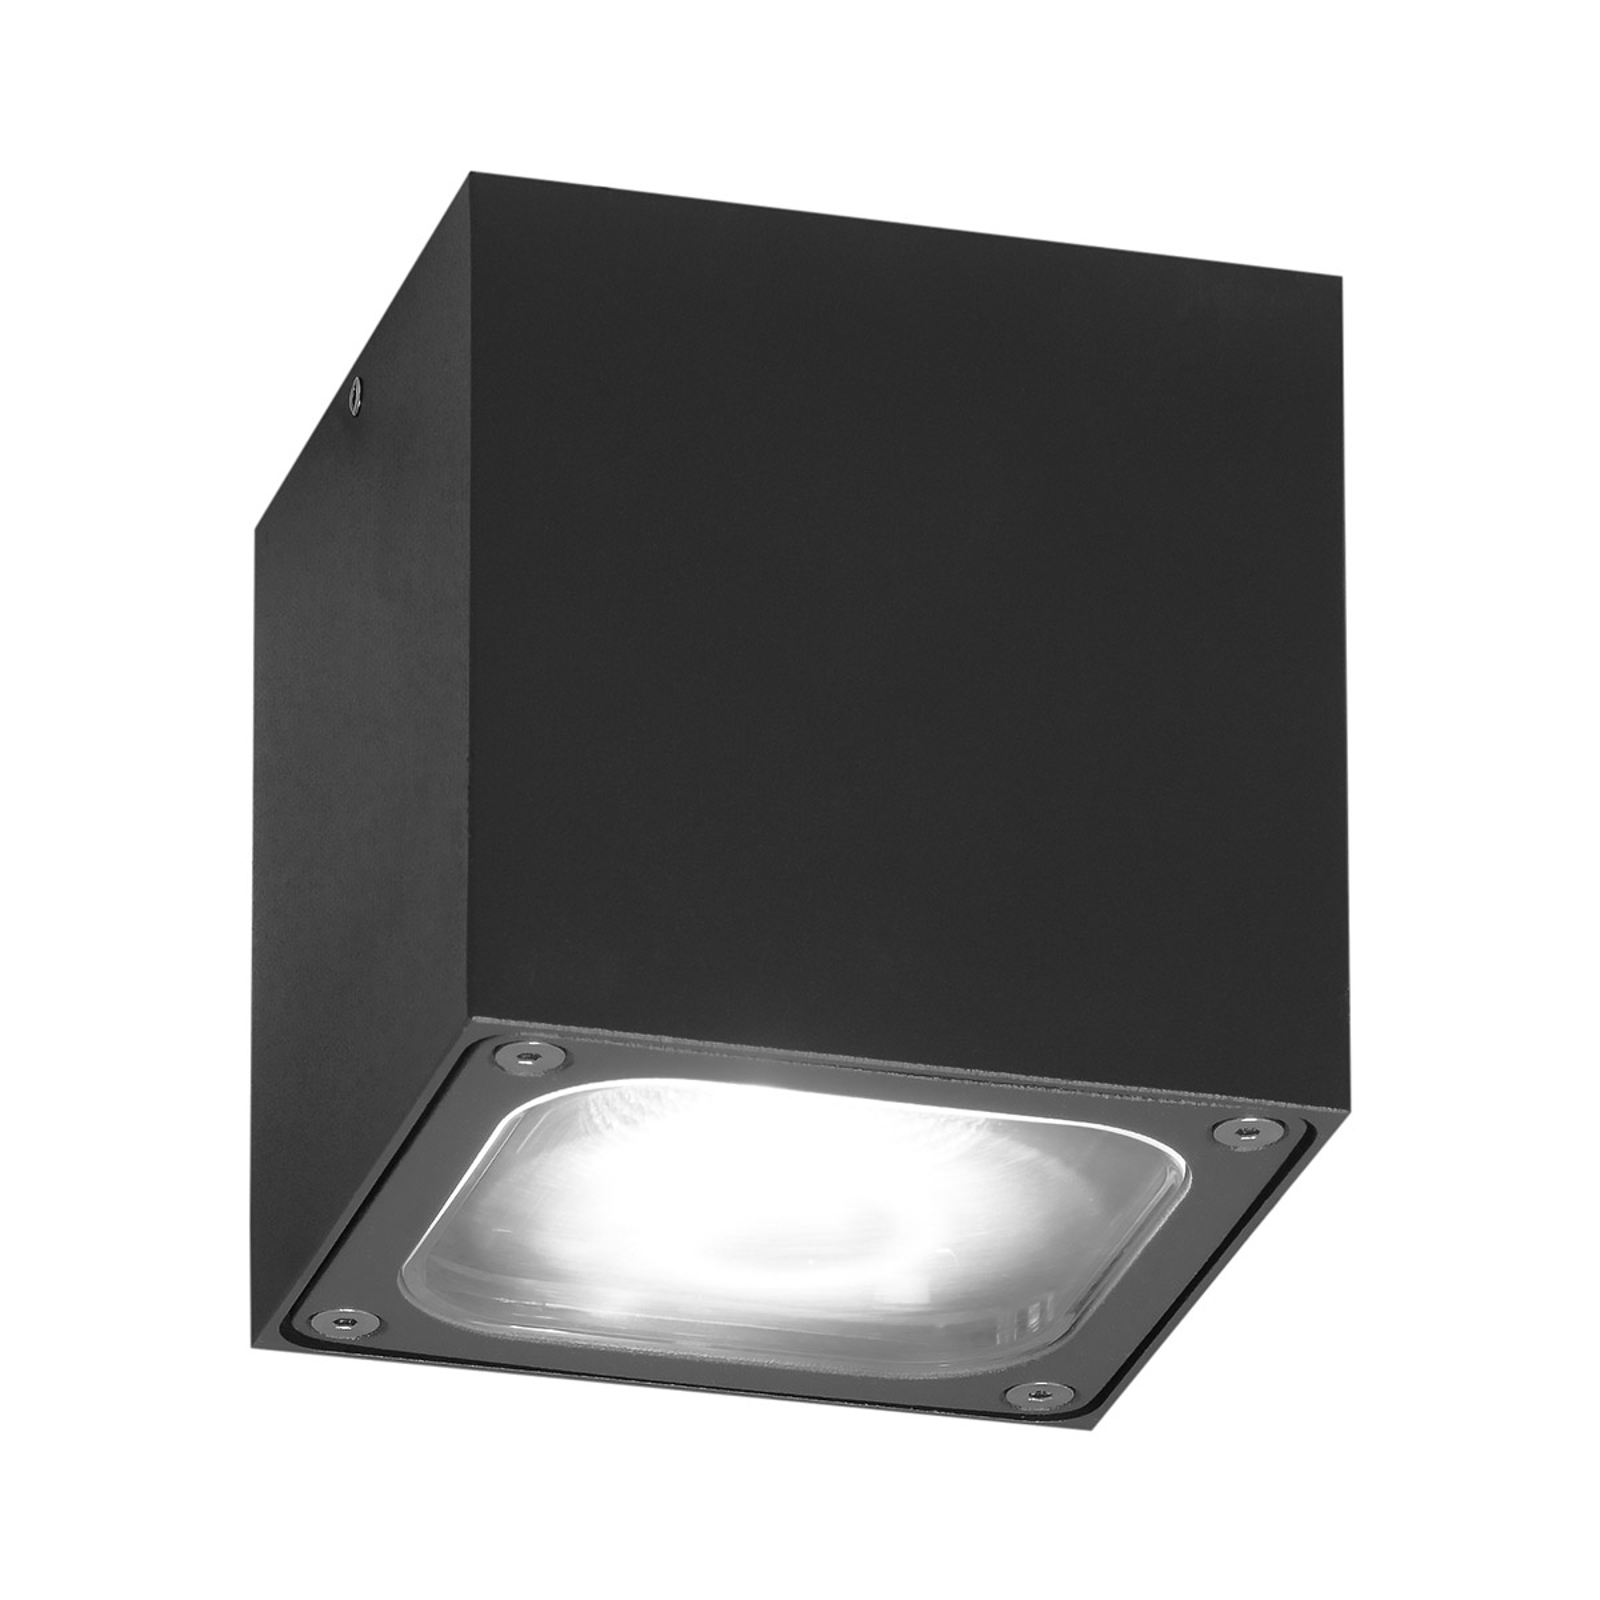 Lampa sufitowa LED Cesena, kostka, antracytowa